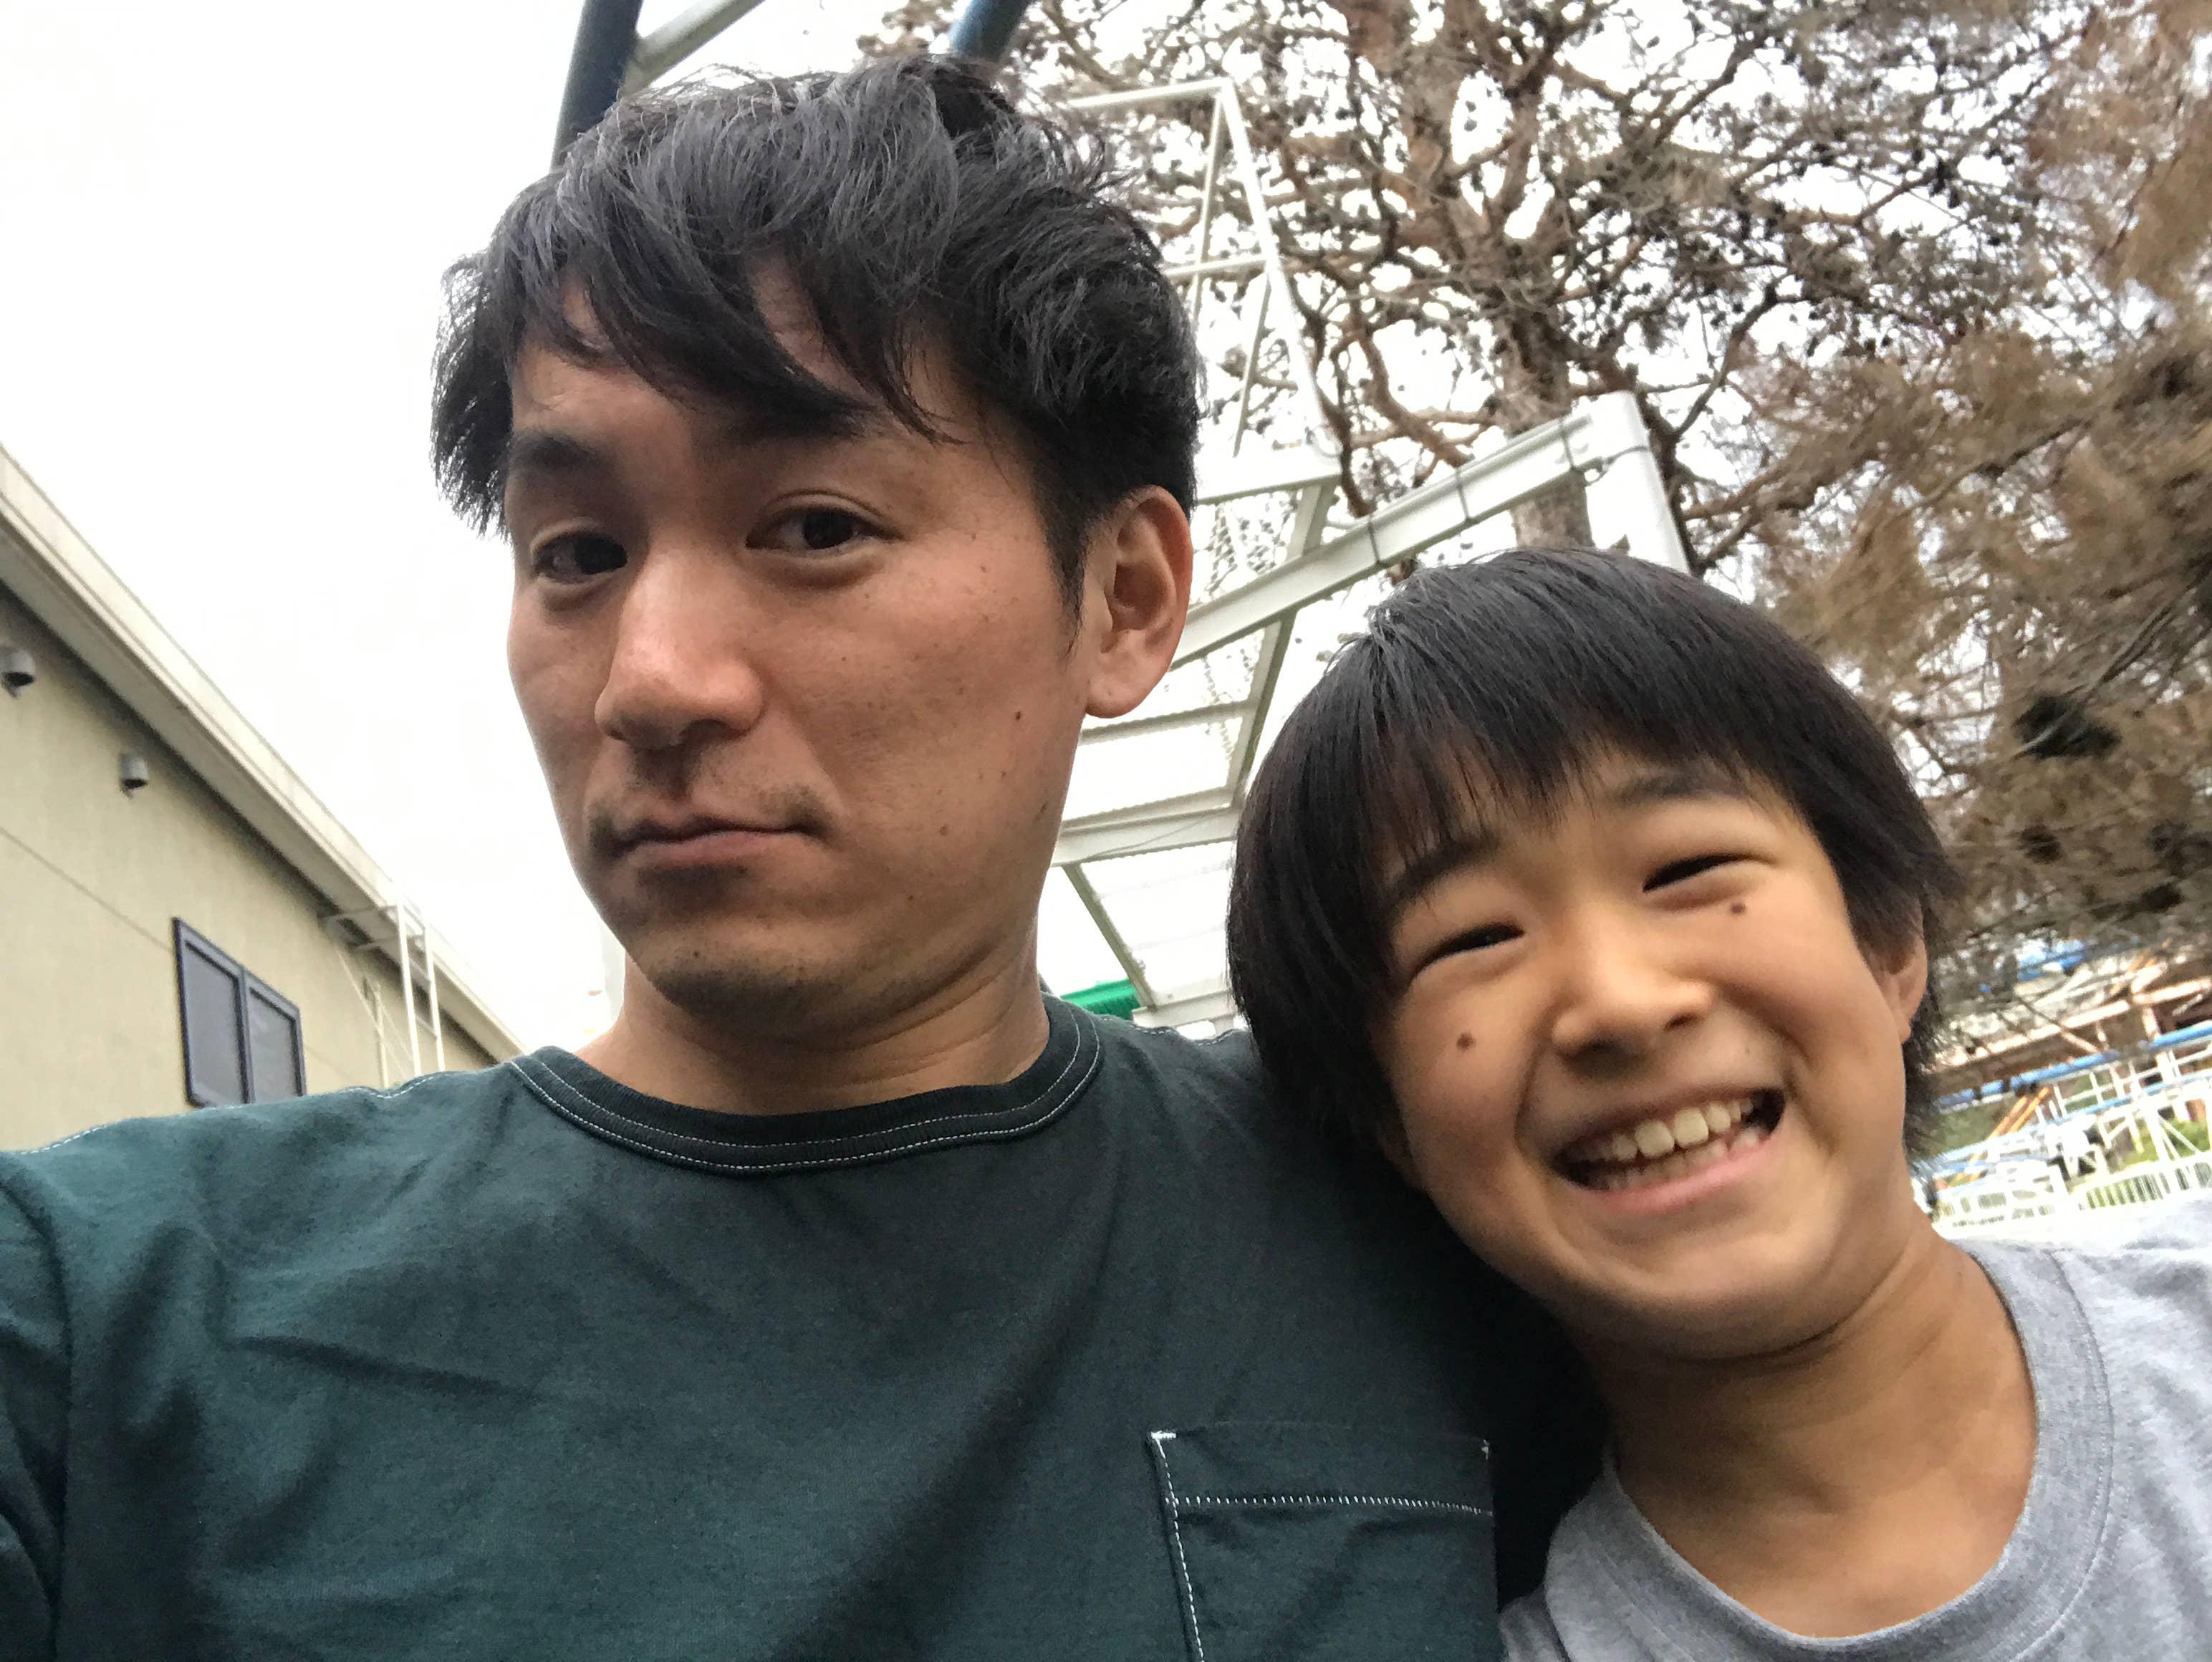 Kohji Matsui